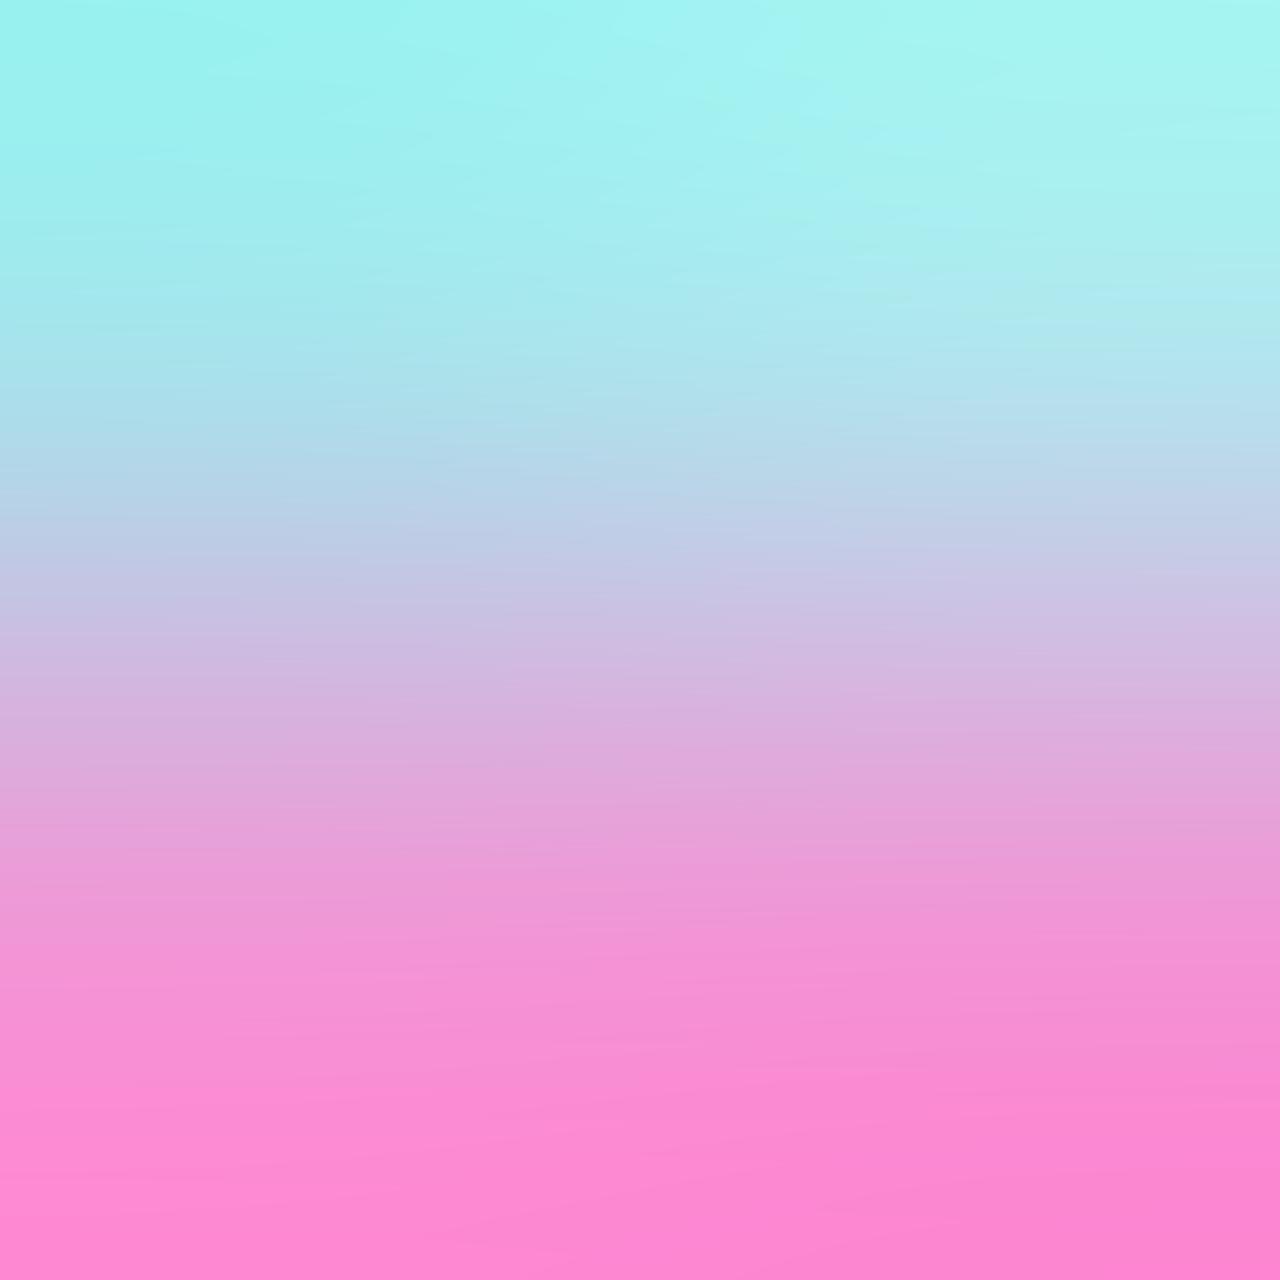 Stone Logodesign: Colorful Gradient 9299 # Logodesign